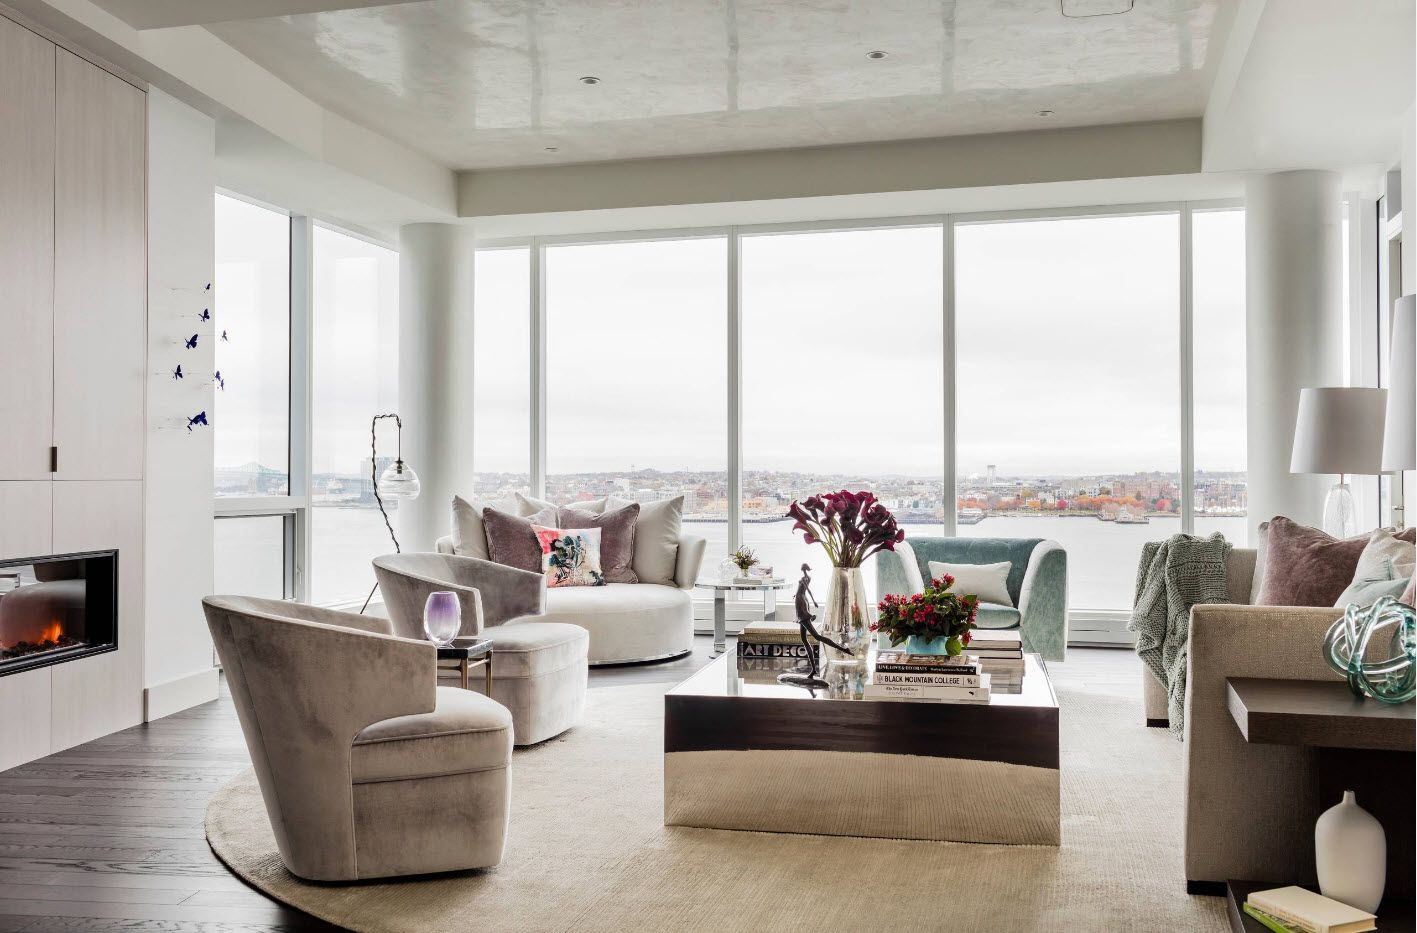 Panoramic windows all round the spacious living room